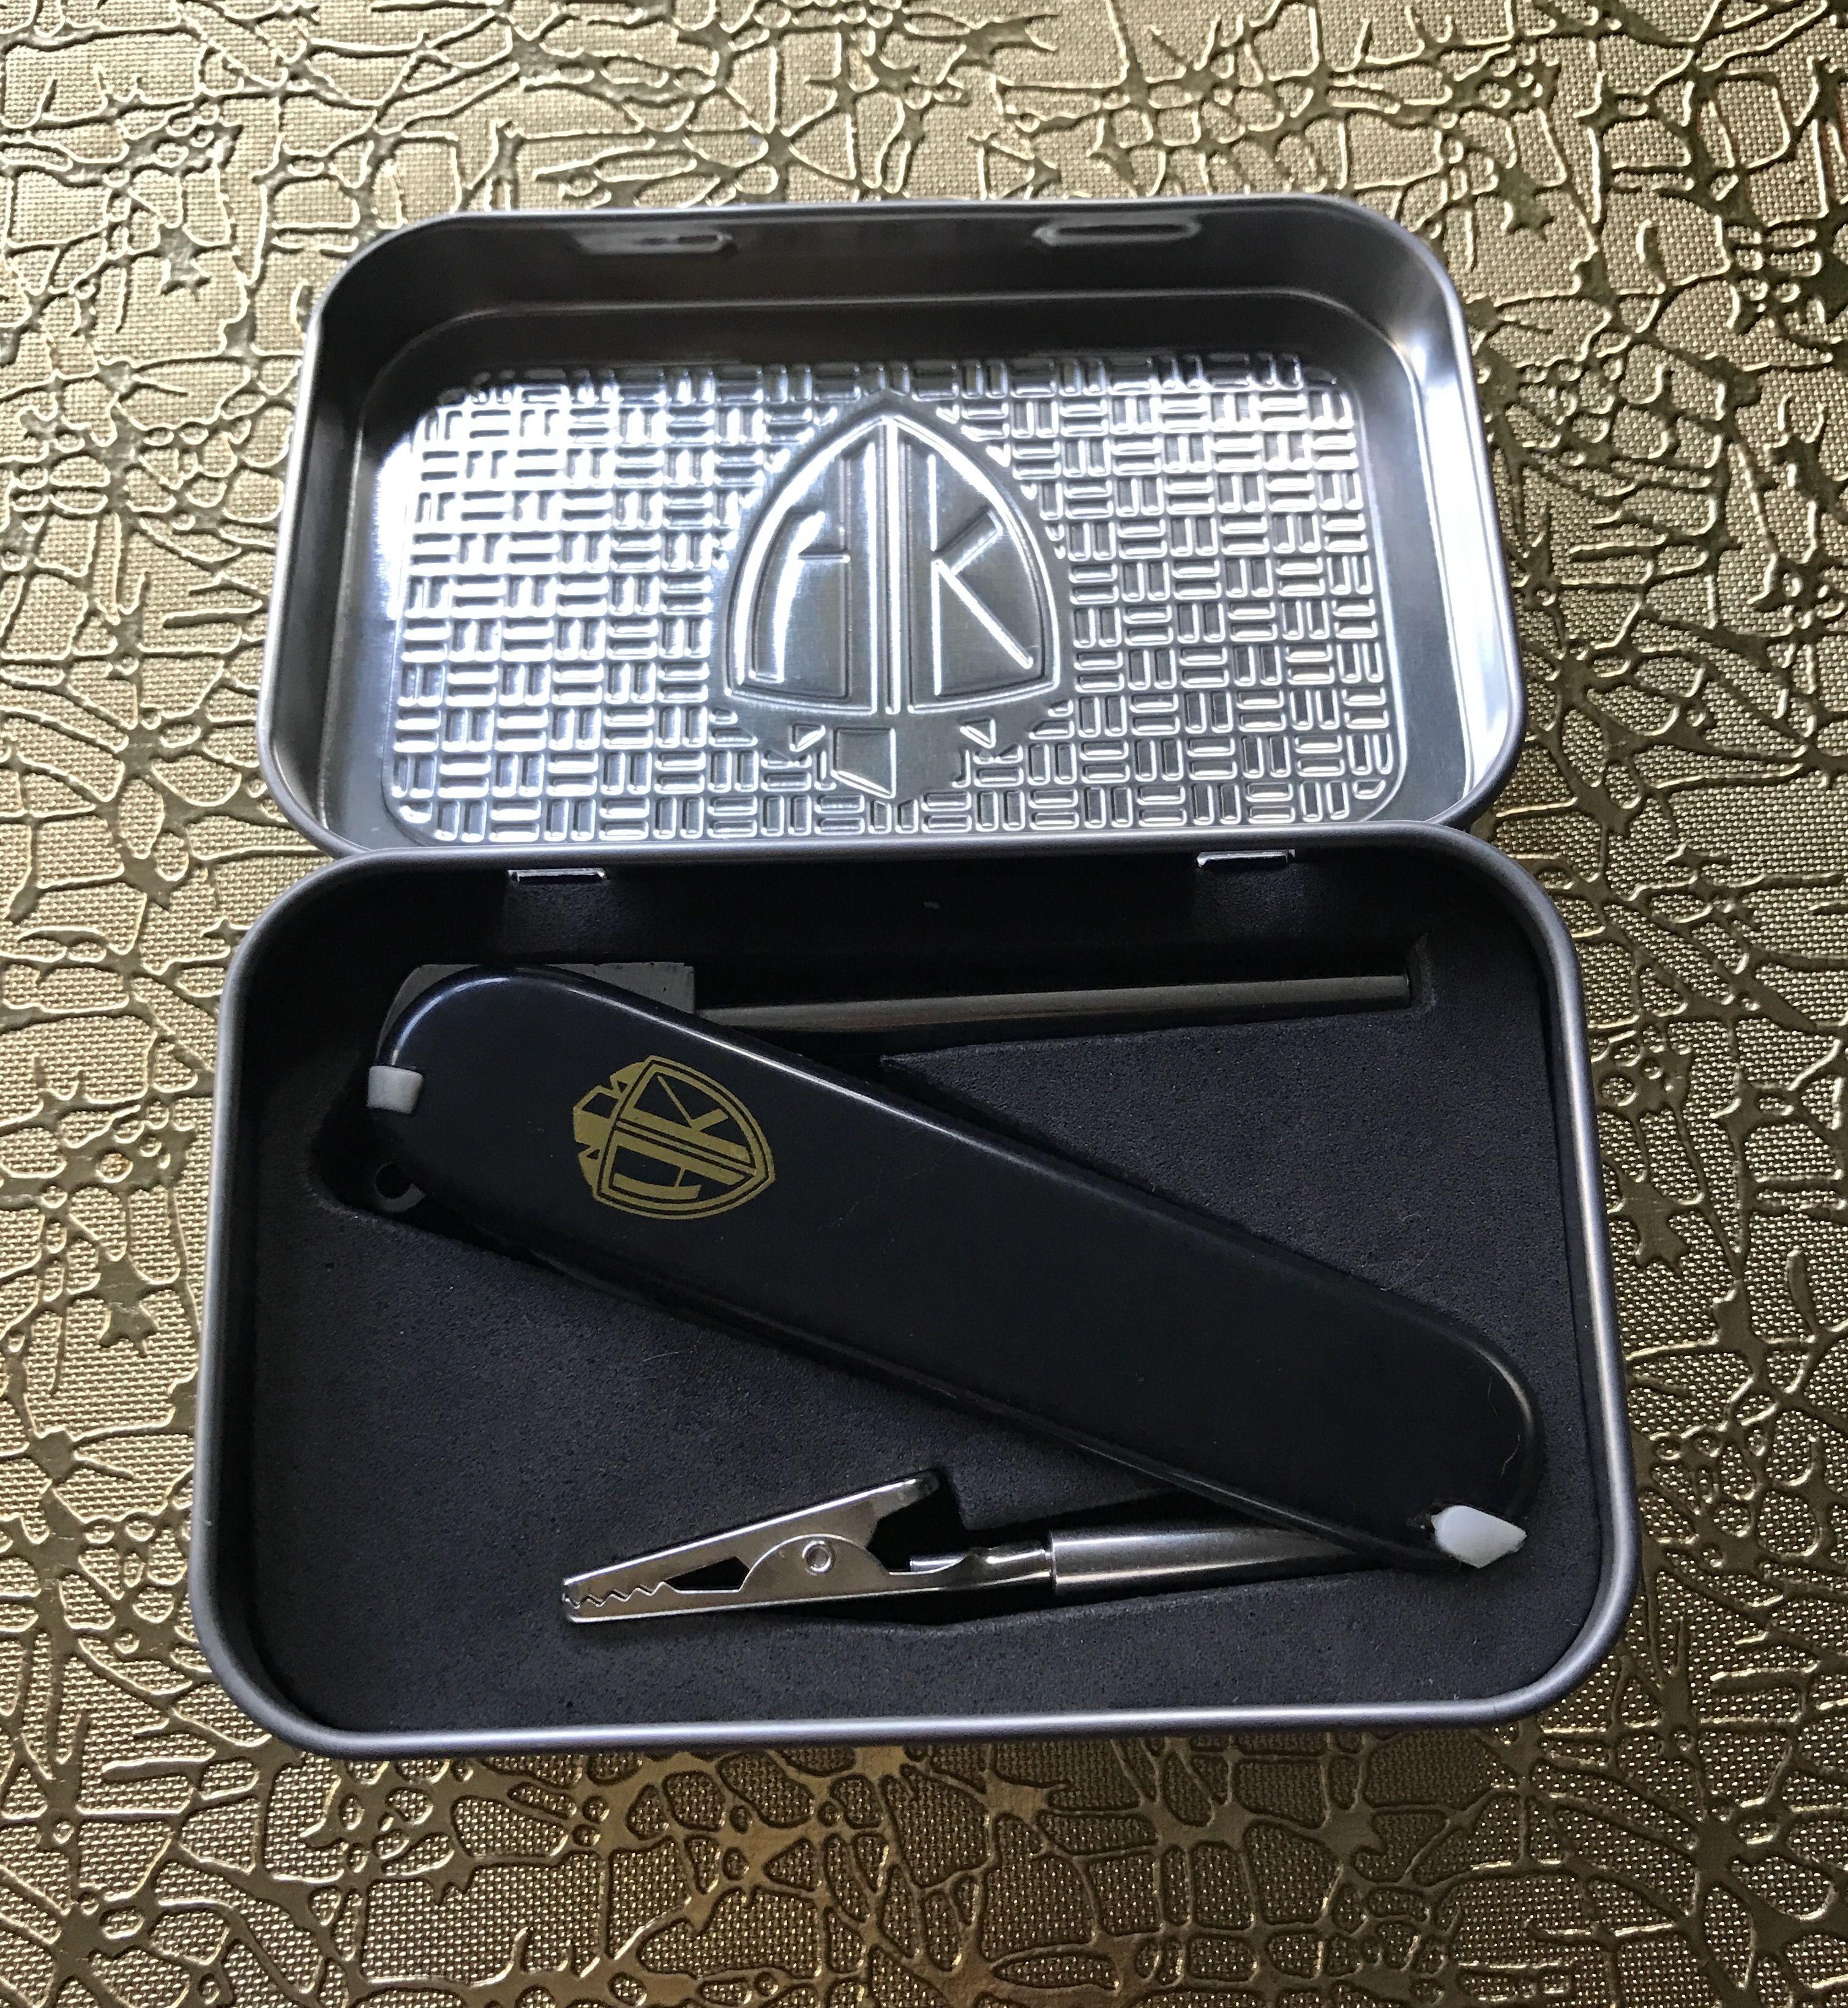 Wedding Gift From Groomsmen: High Knife Presented In Its Metal Stash Box Www.highknife